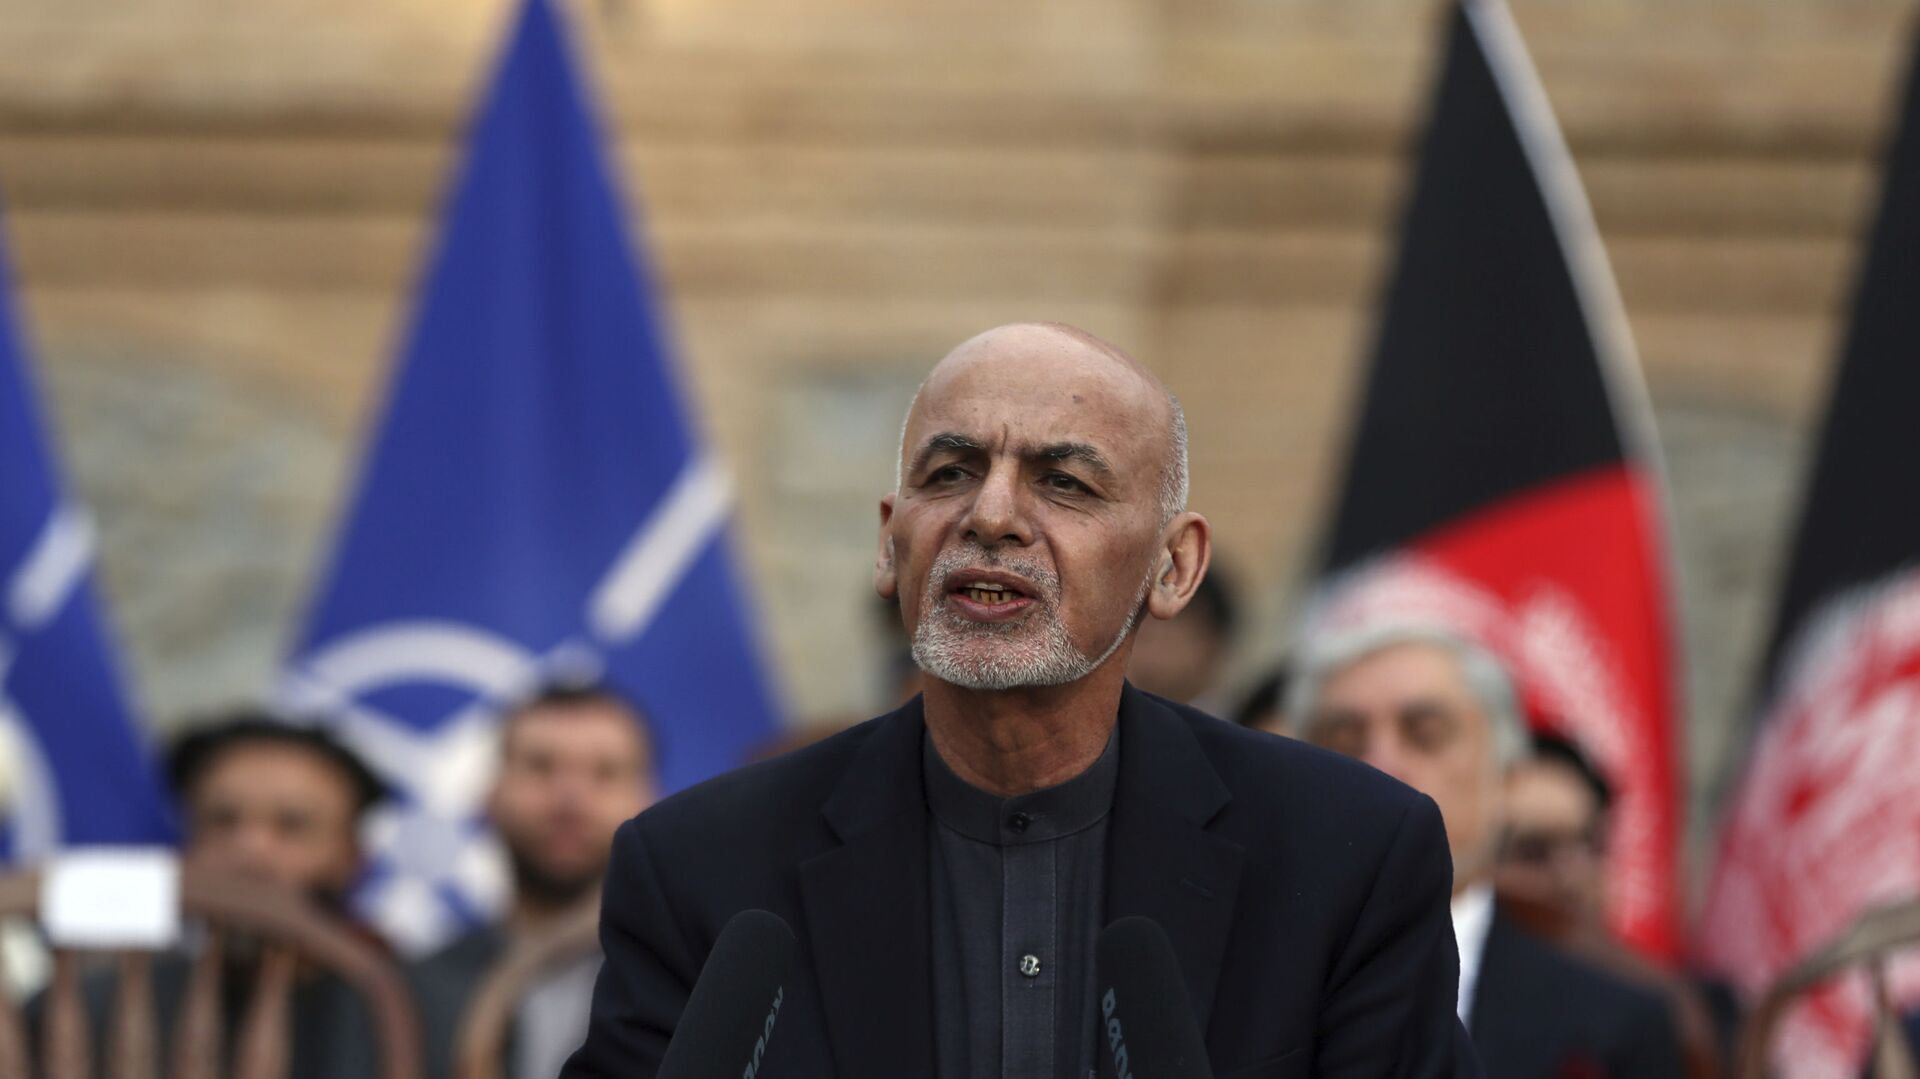 Ashraf Ghani, el presidente de Afganistán  - Sputnik Mundo, 1920, 24.09.2021